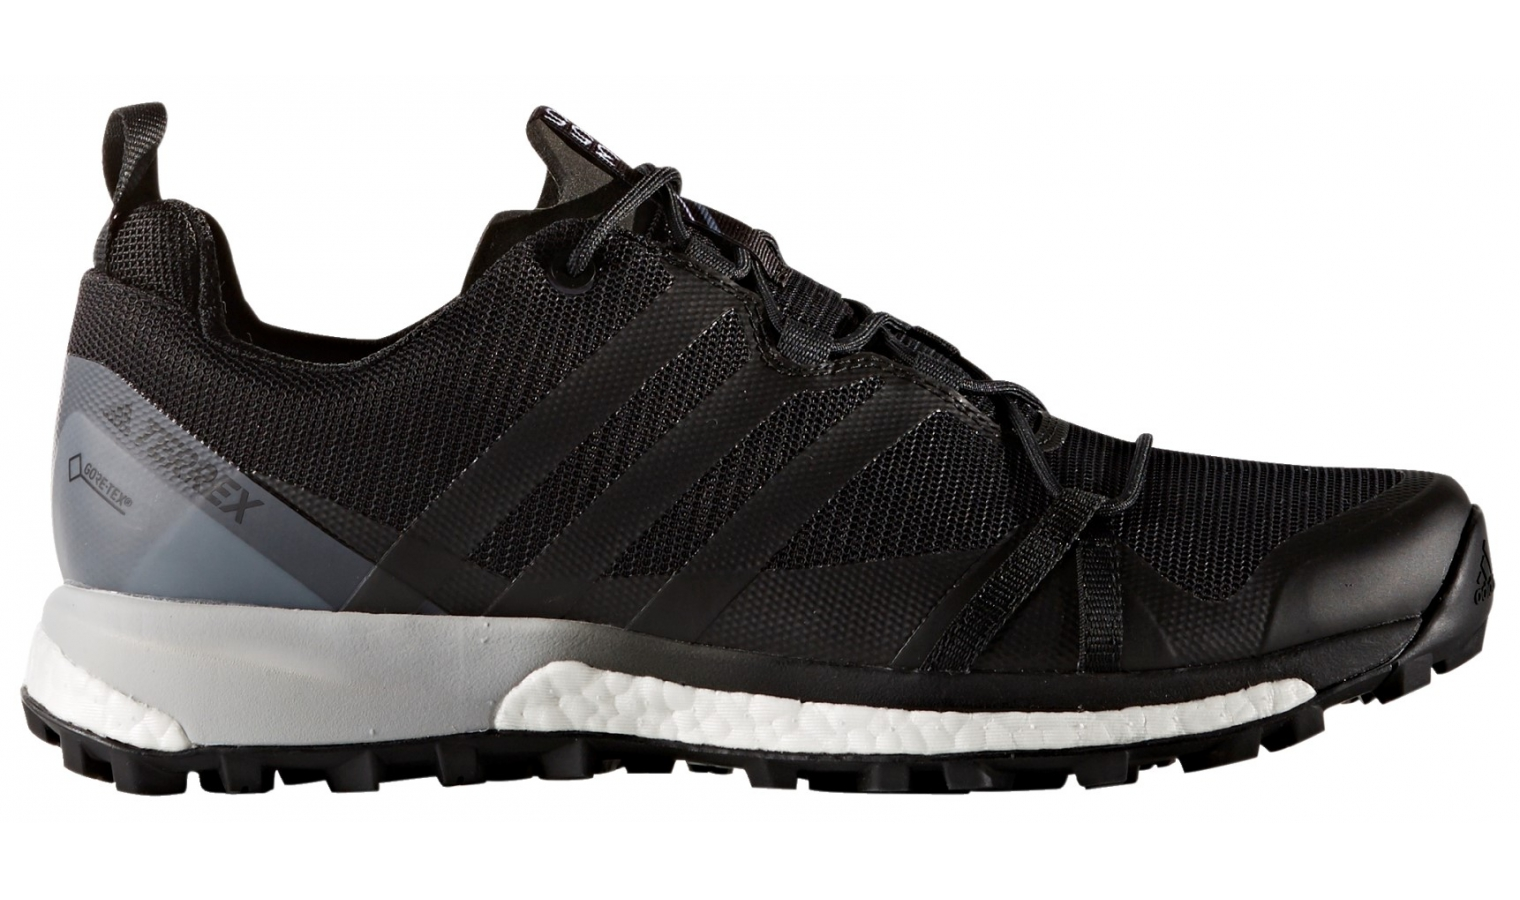 5f1dde1696d Pánské běžecké boty adidas TERREX AGRAVIC GTX černé